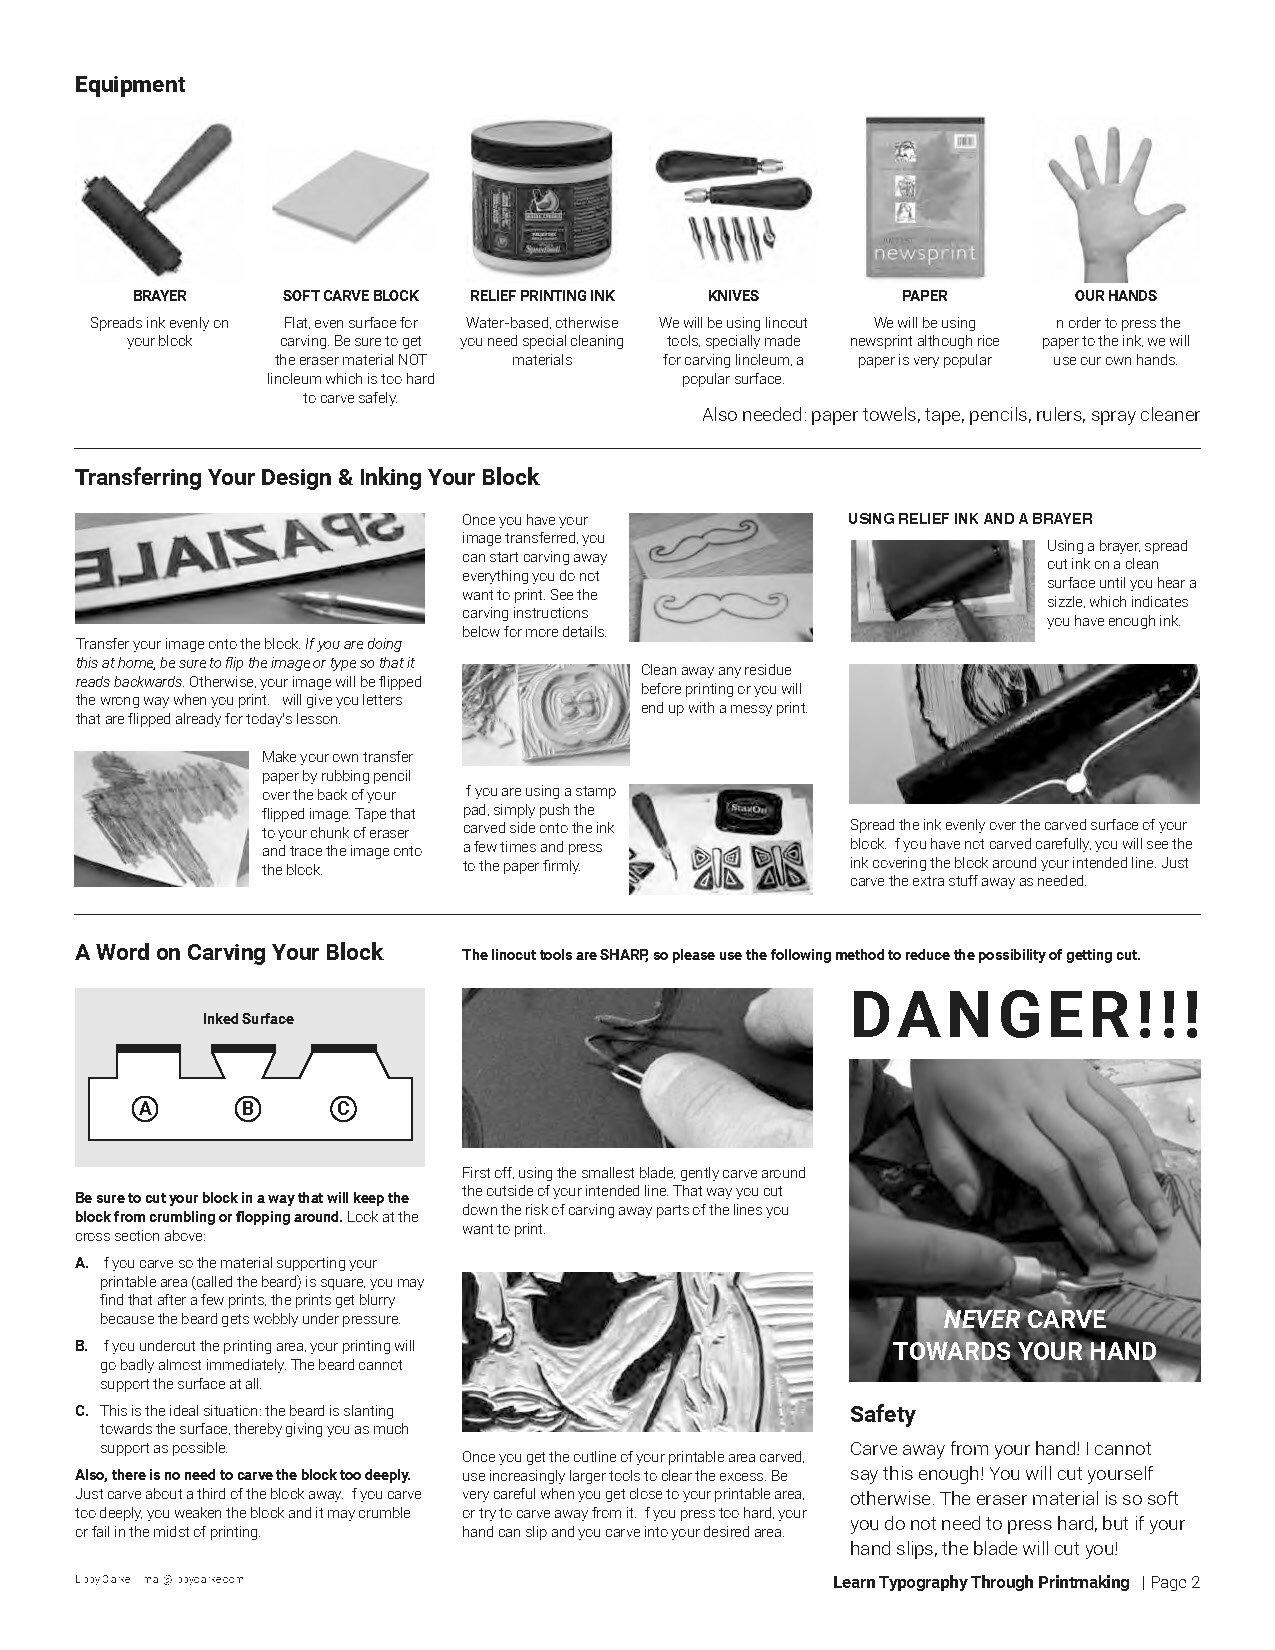 Materials_RISD_final_Page_08.jpg